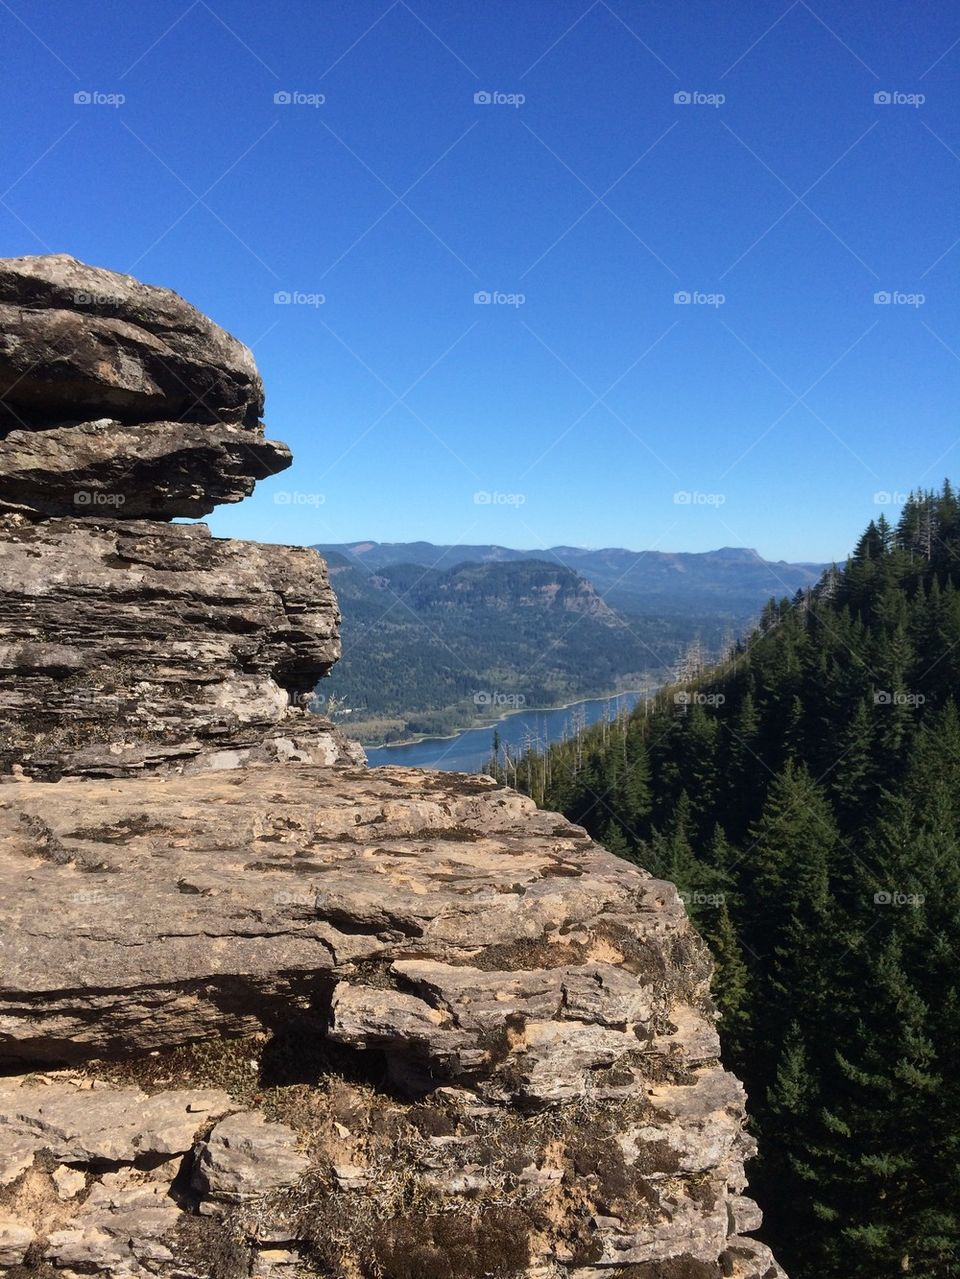 Between a rock and a hard spot